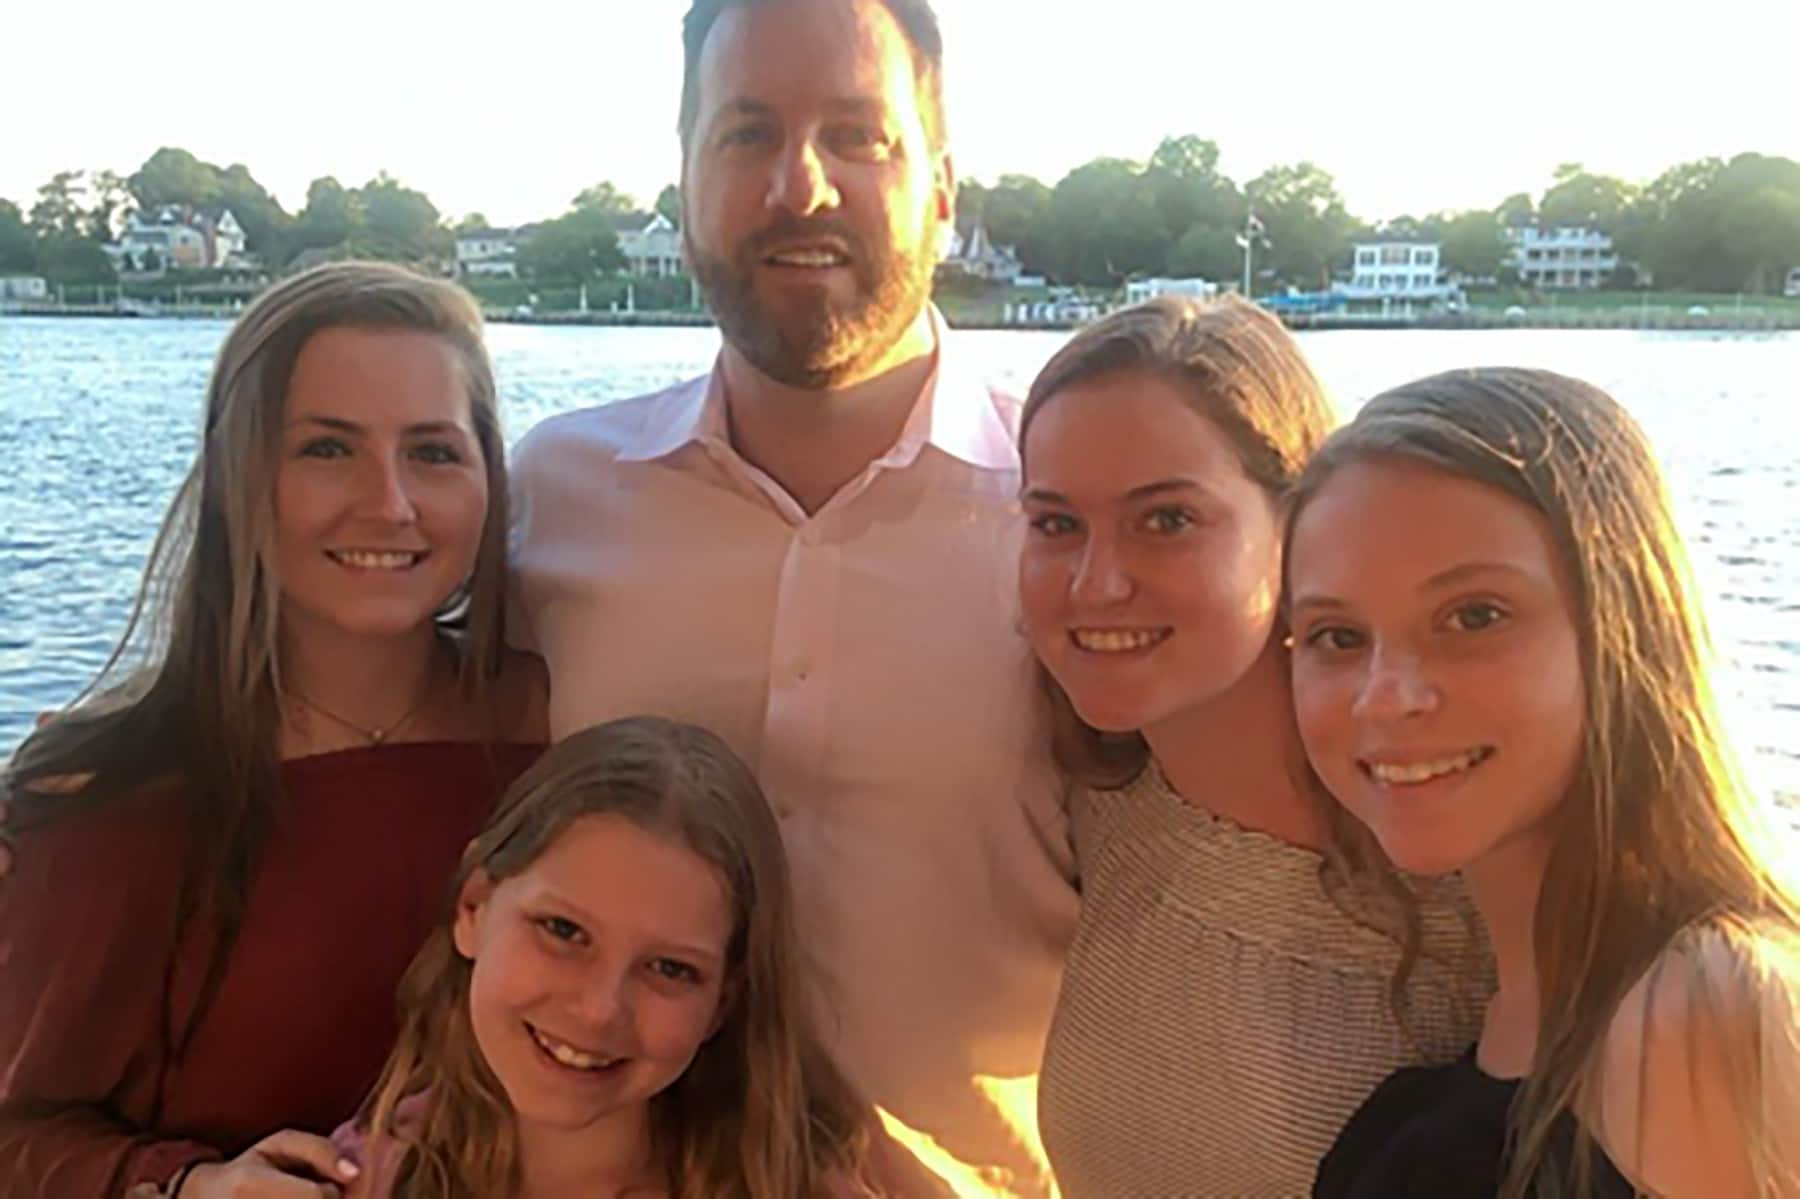 John Munley Financial Advisor at wHealth Advisors and family